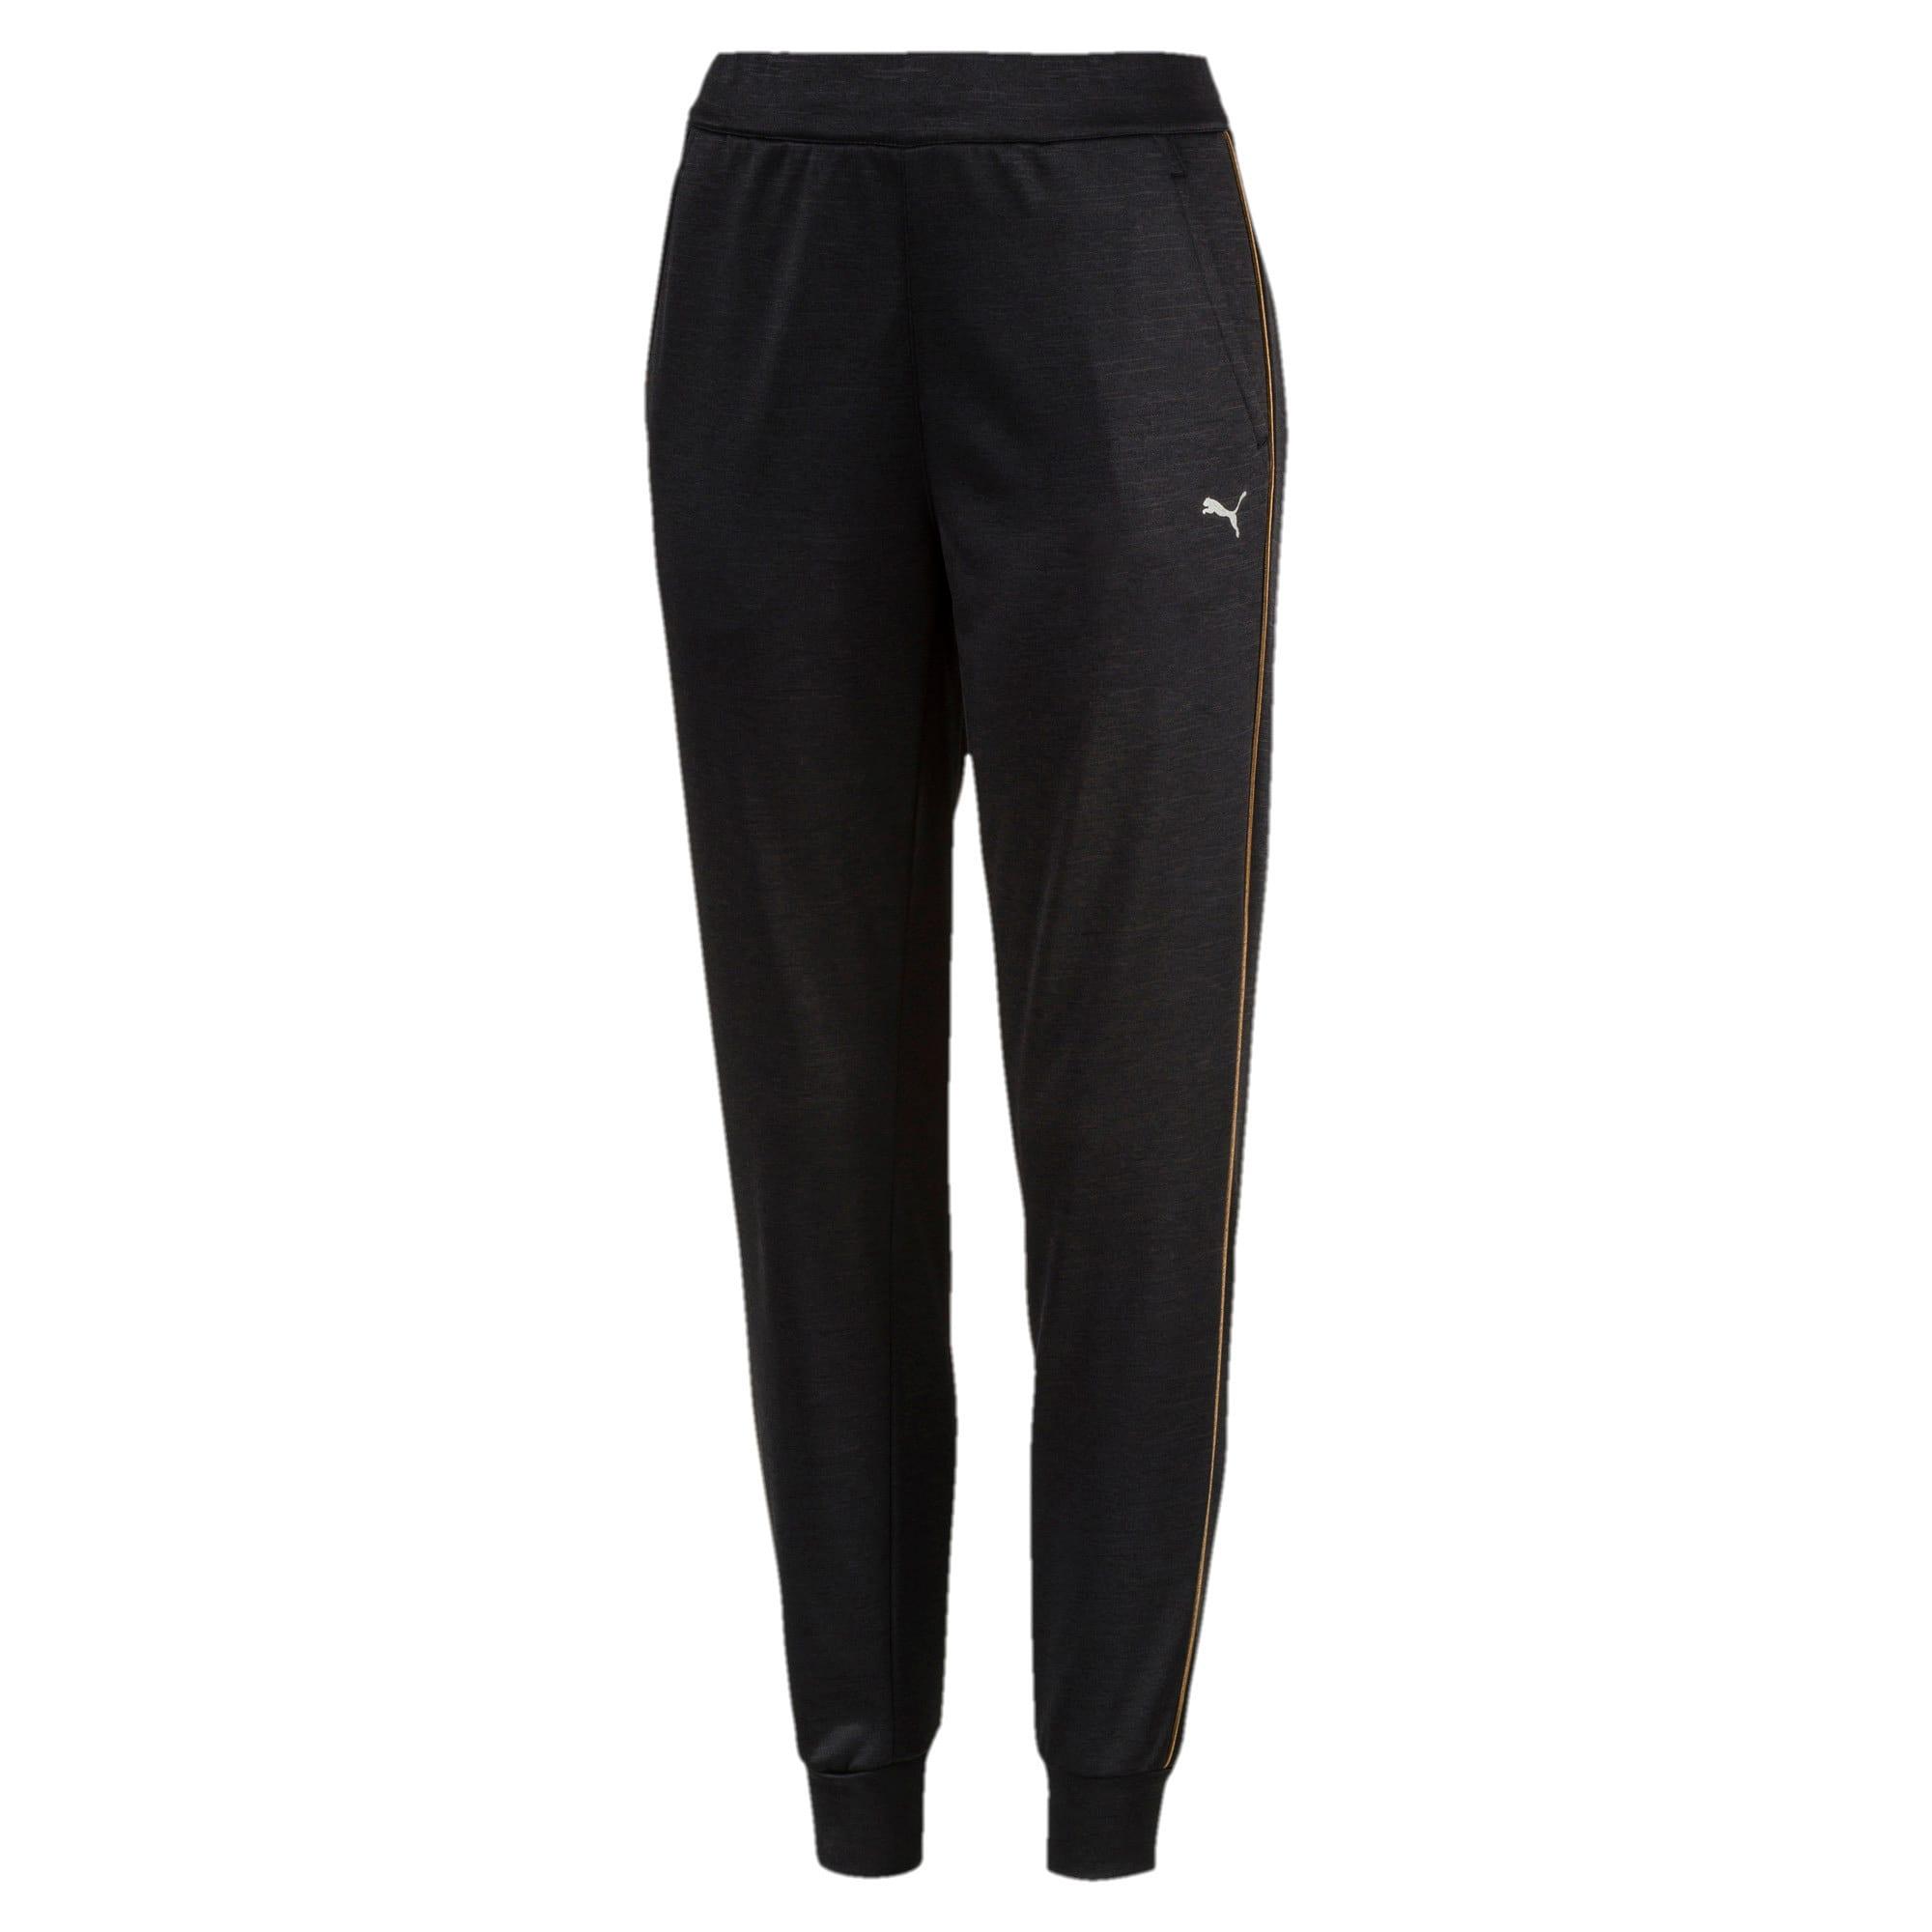 Thumbnail 1 of Be Ready Women's Sweatpants, Puma Black Heather, medium